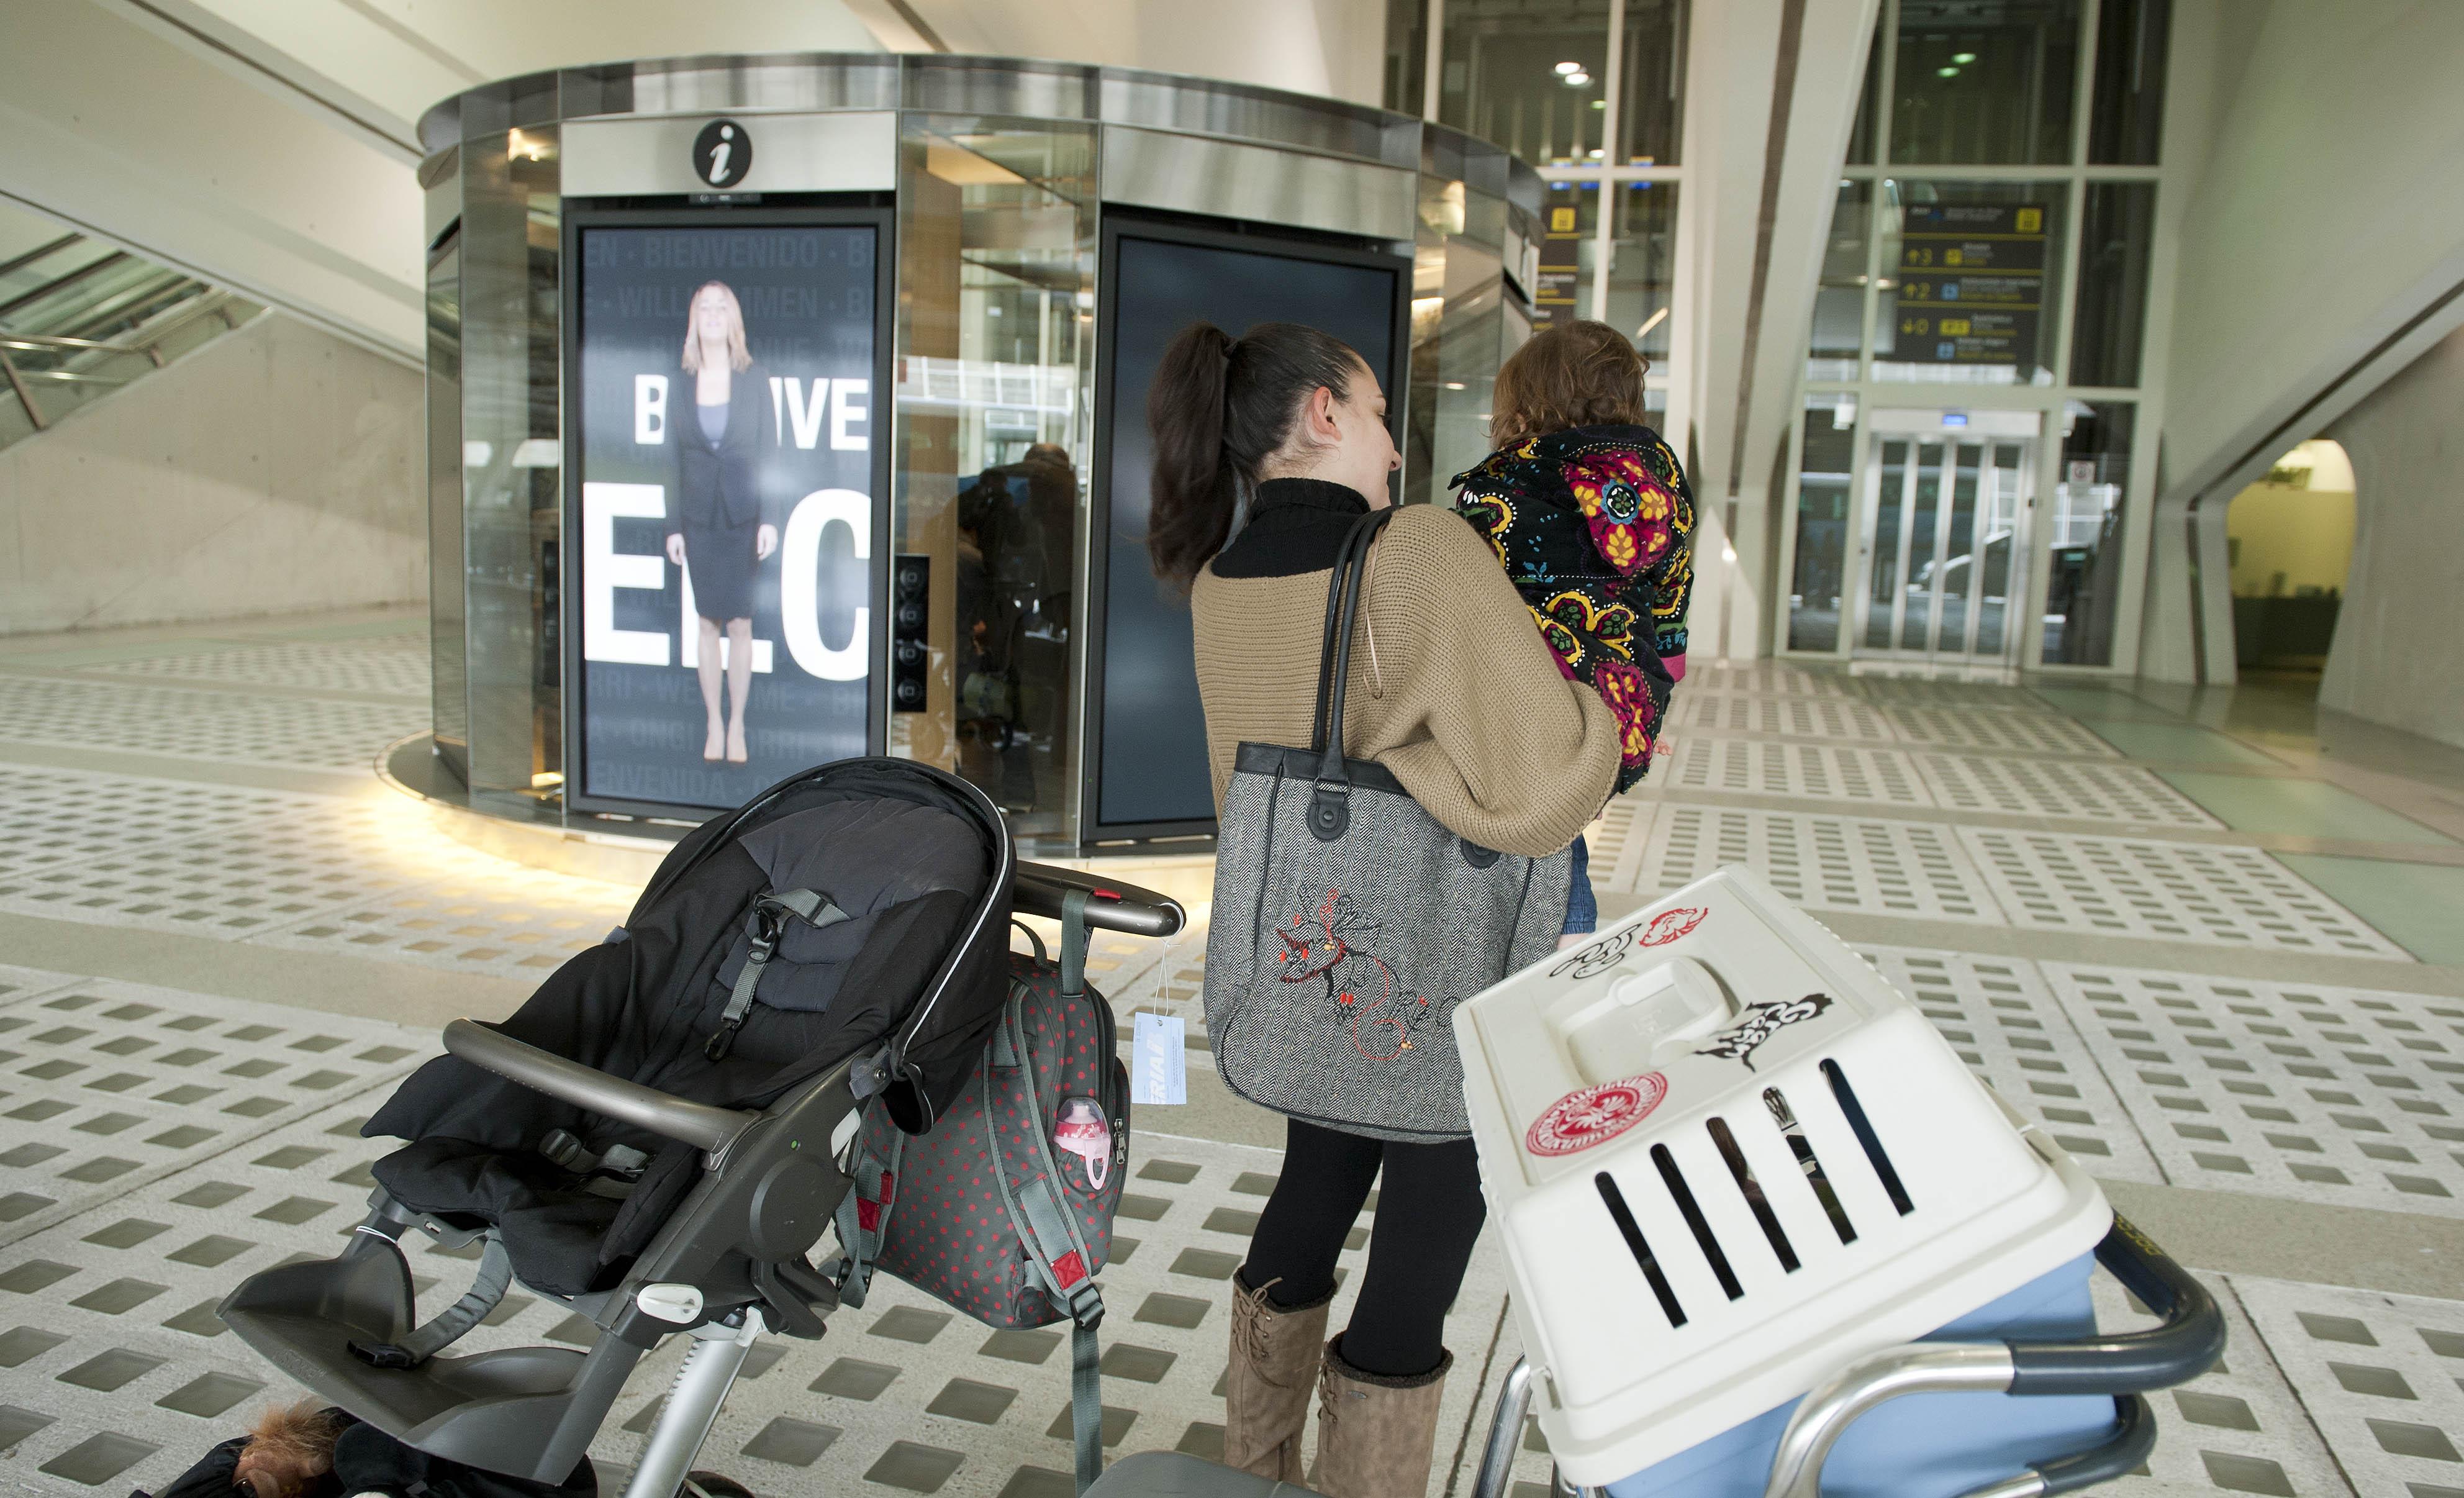 2011_12_30_turismo_oficina_loiu9.jpg